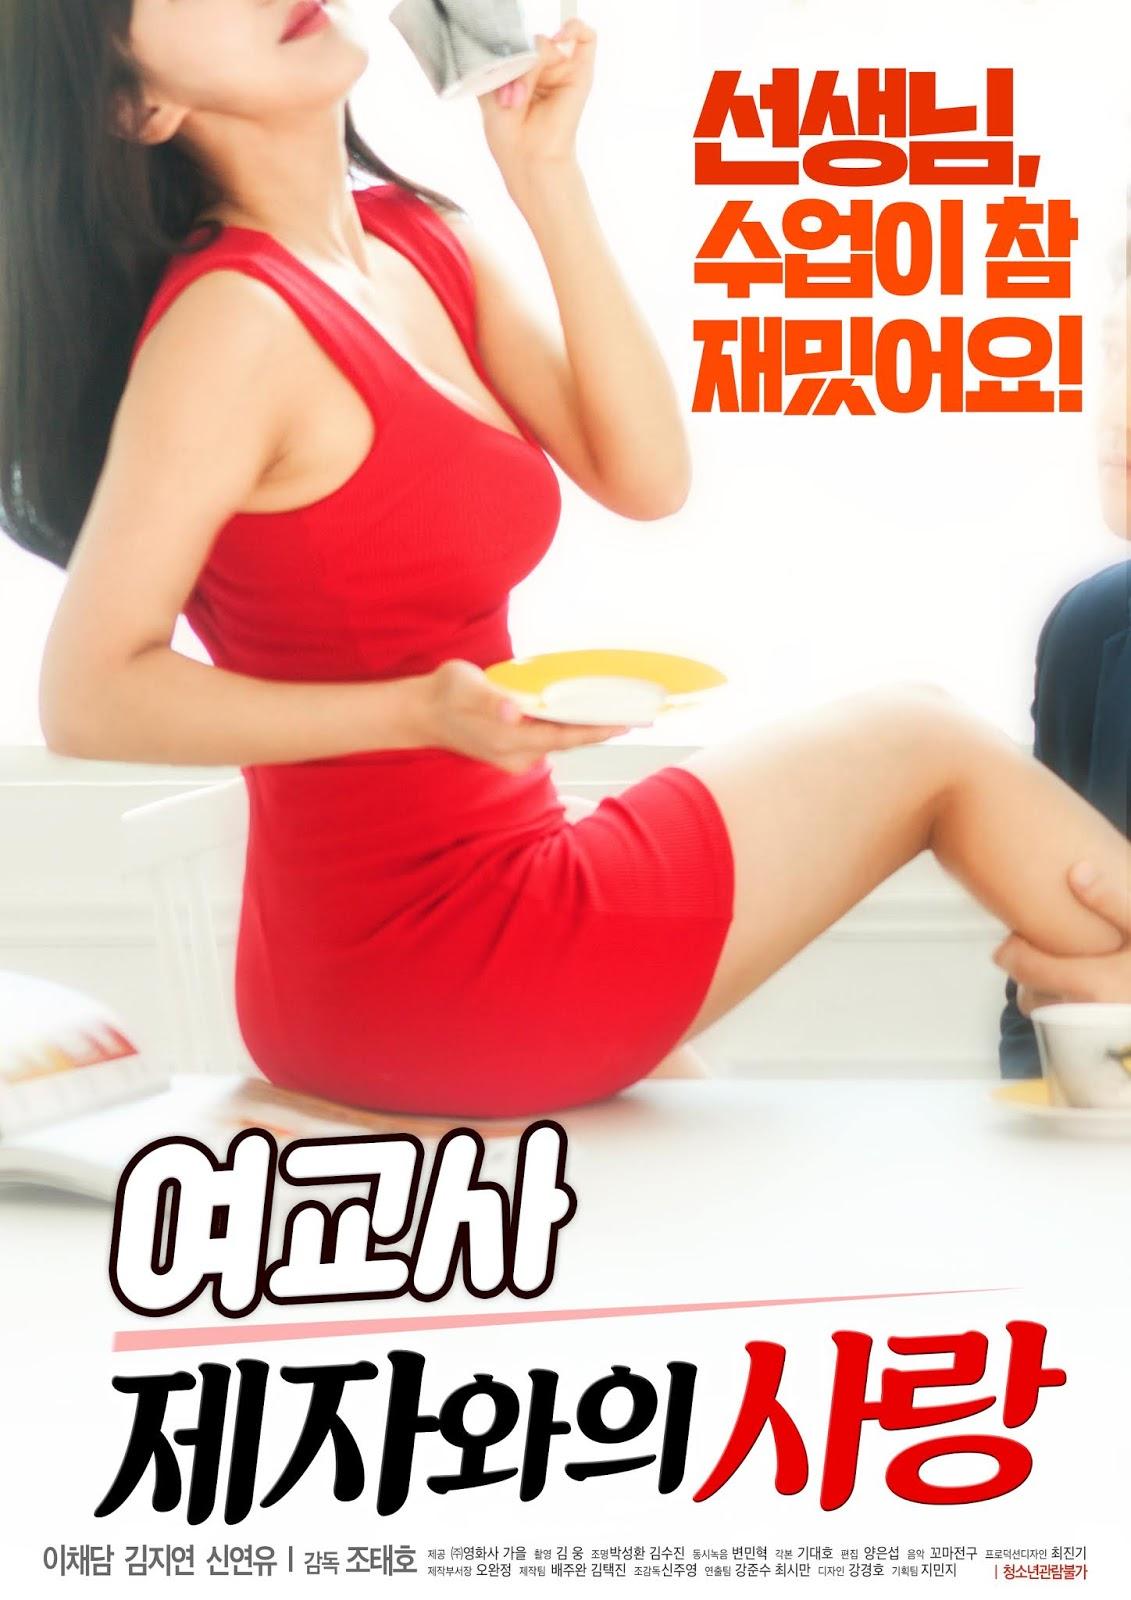 Love Between Teachers and Students Full Korea 18+ Adult Movie Online Free